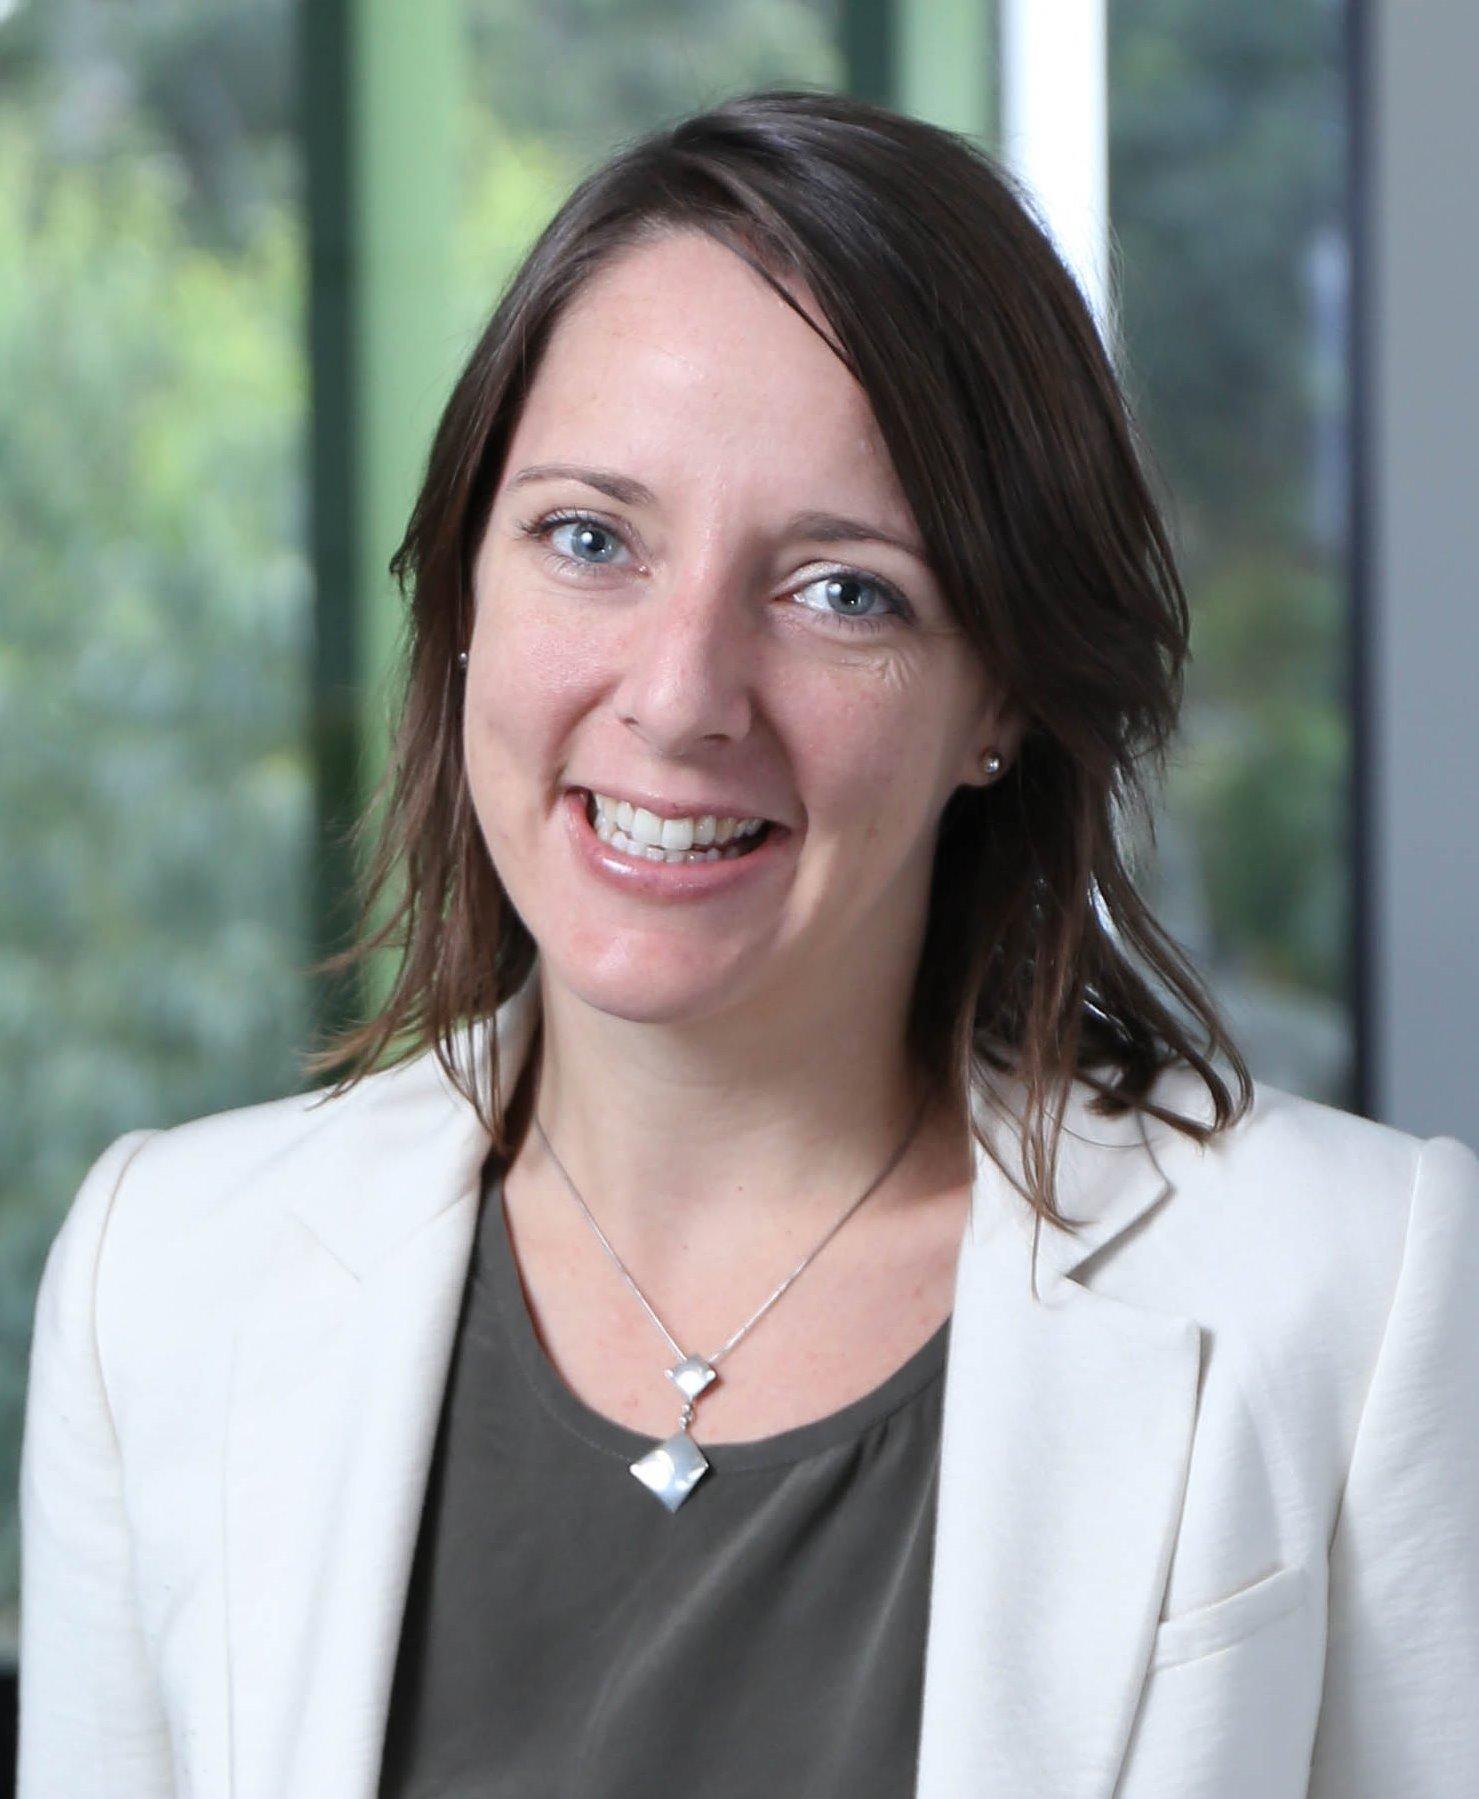 Associate Professor Anita Elizabeth Heywood